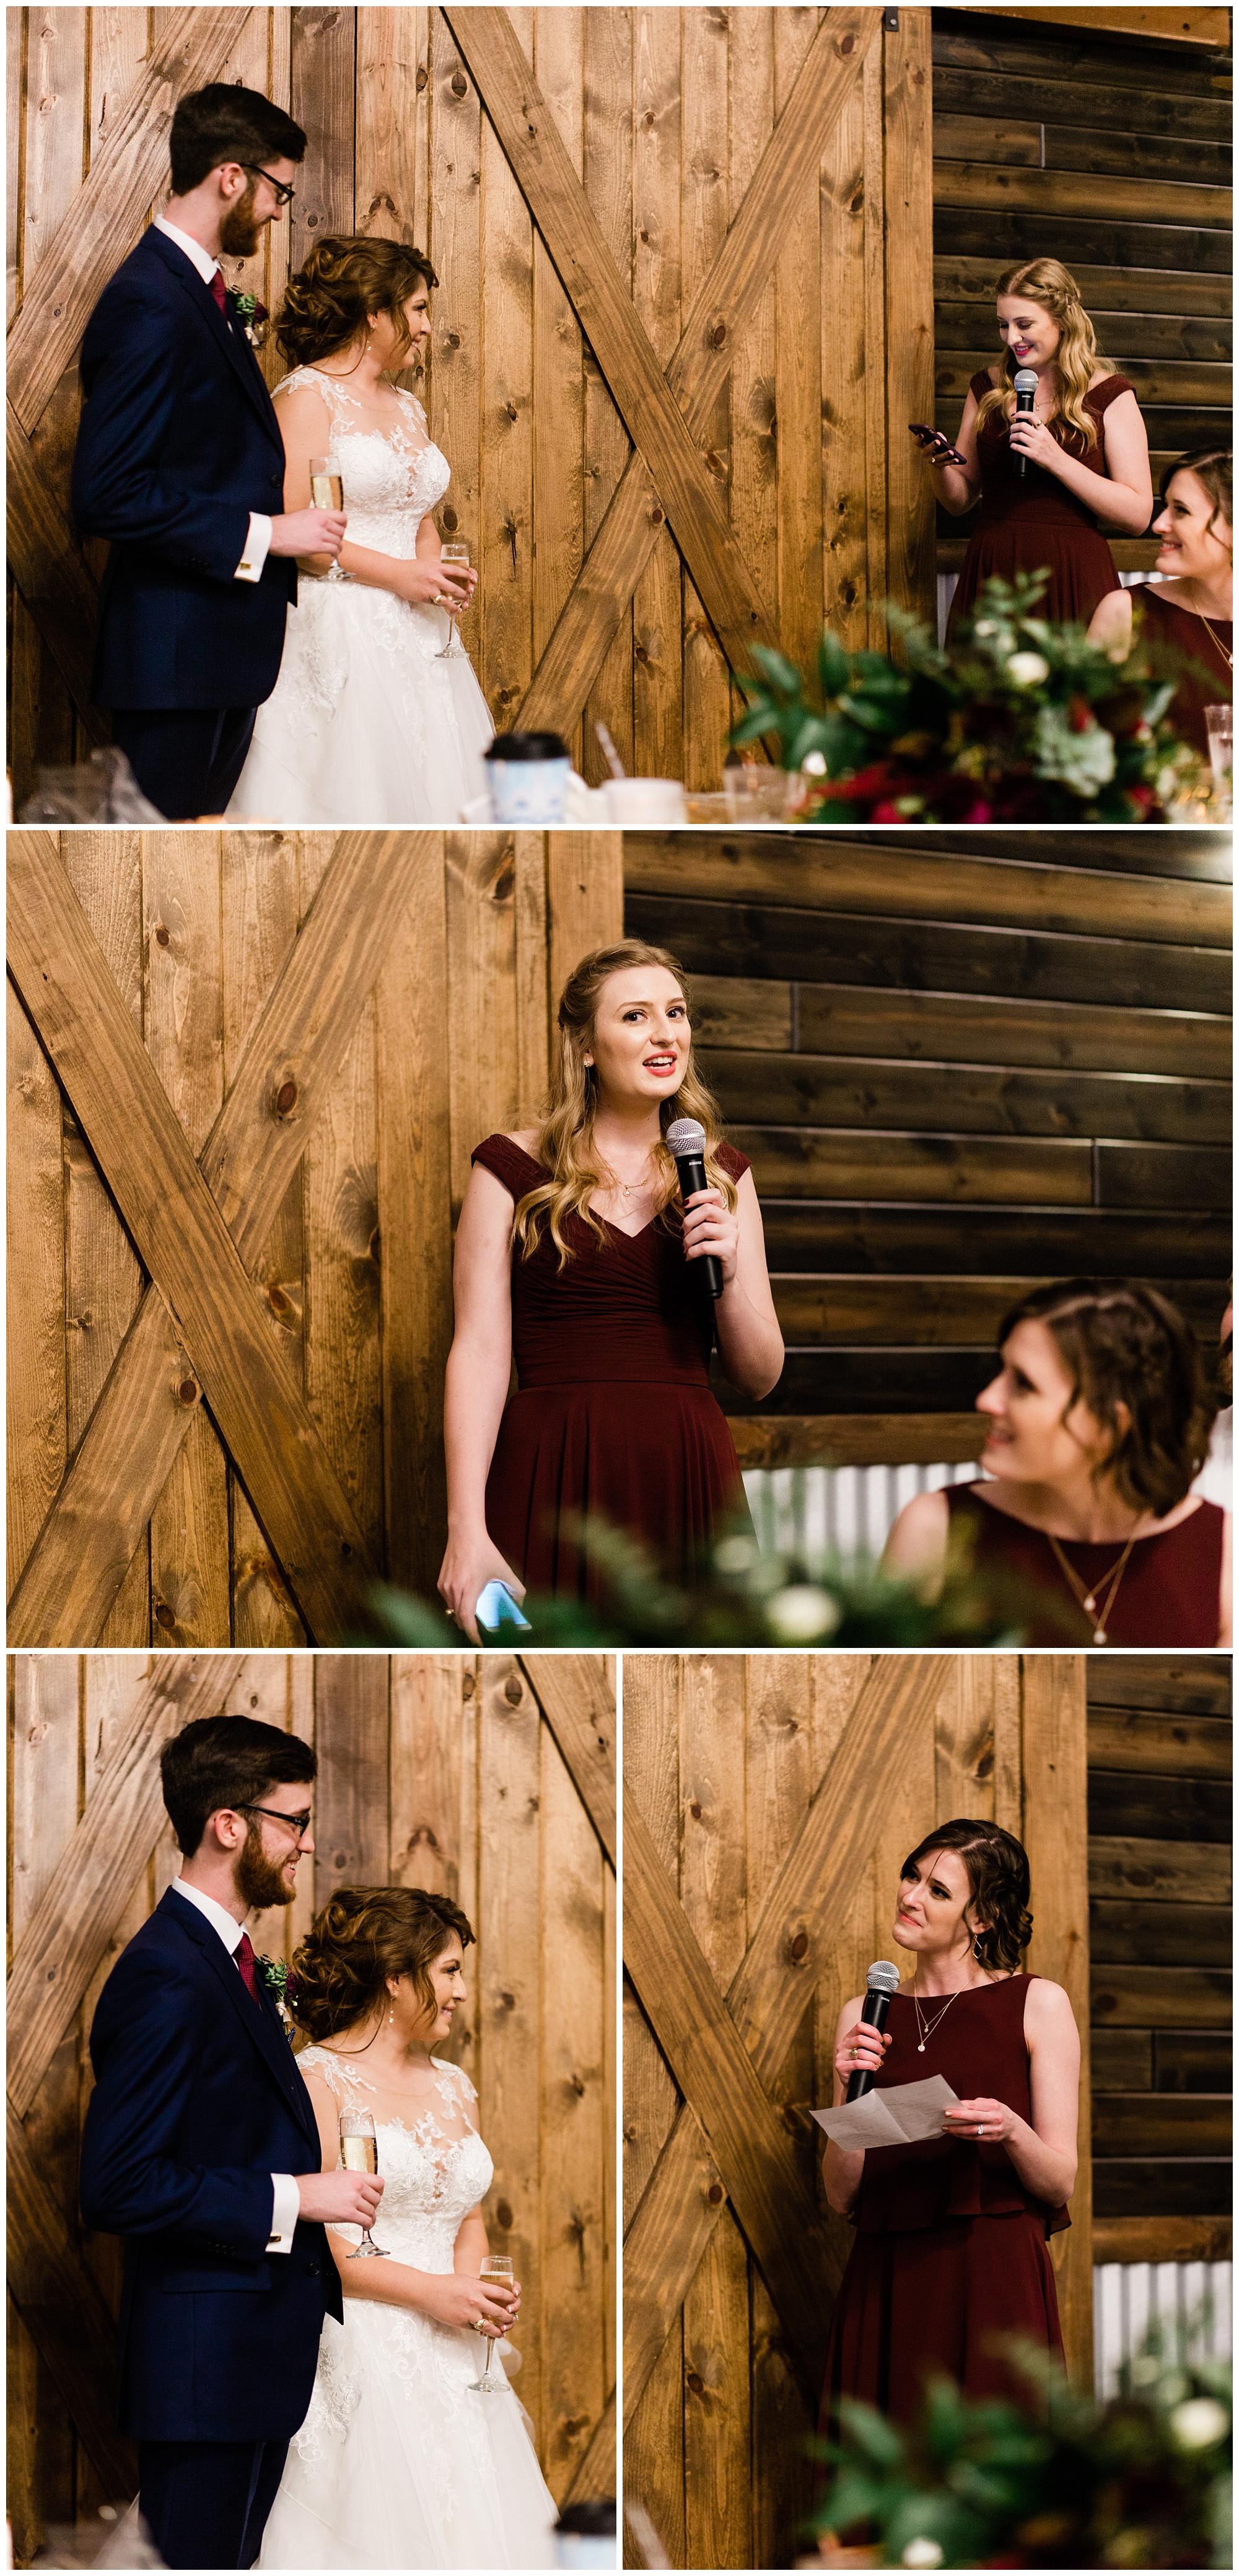 Peach_Creek_Ranch_Wedding_Kristina_Ross_Photography_0037.jpg